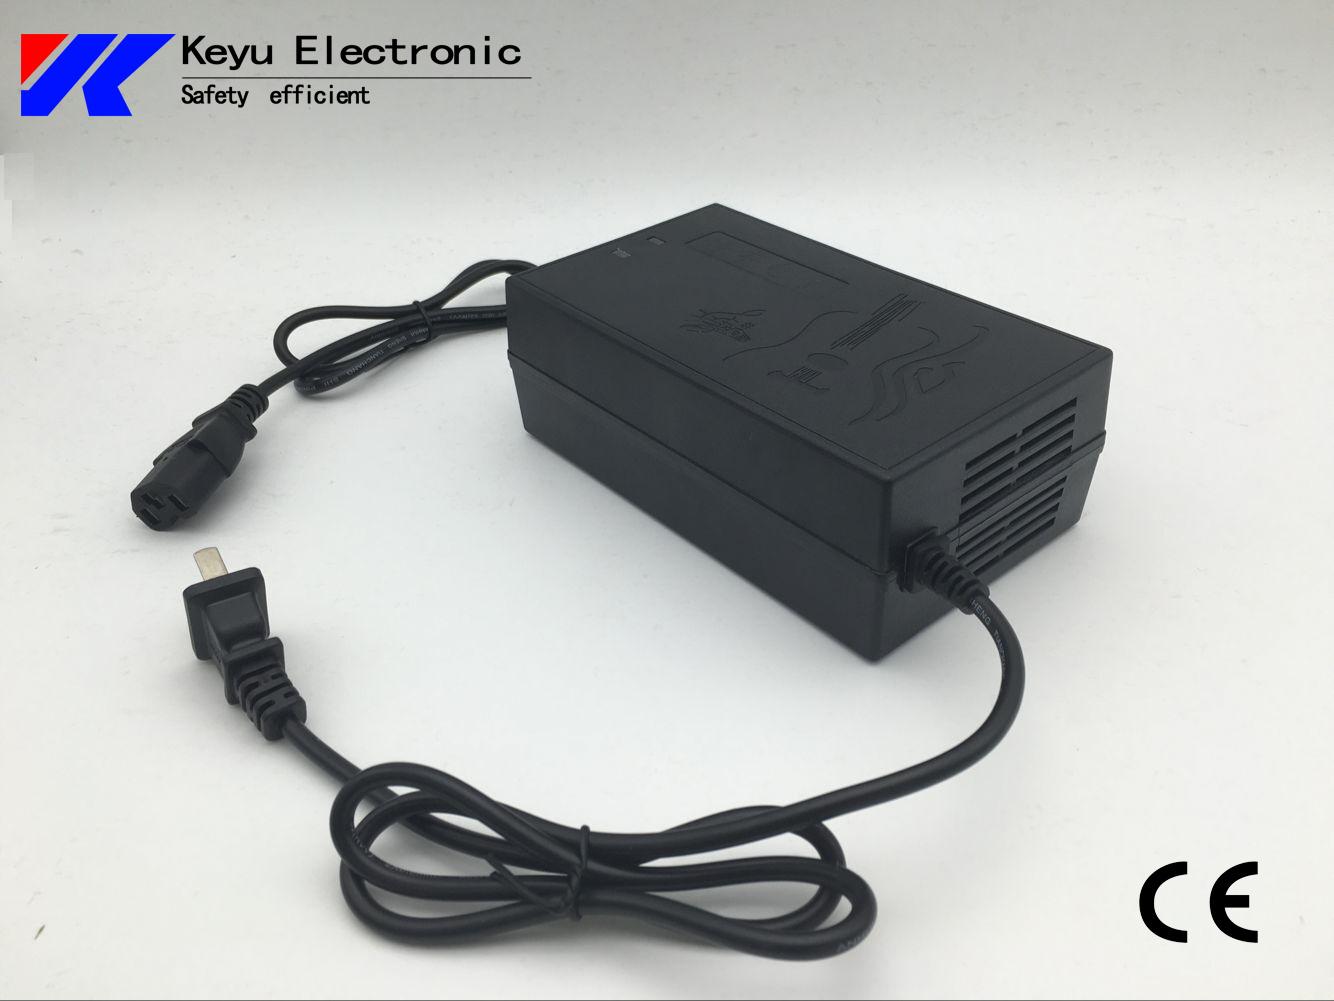 Ebike Charger12V-20ah (Lead Acid battery)